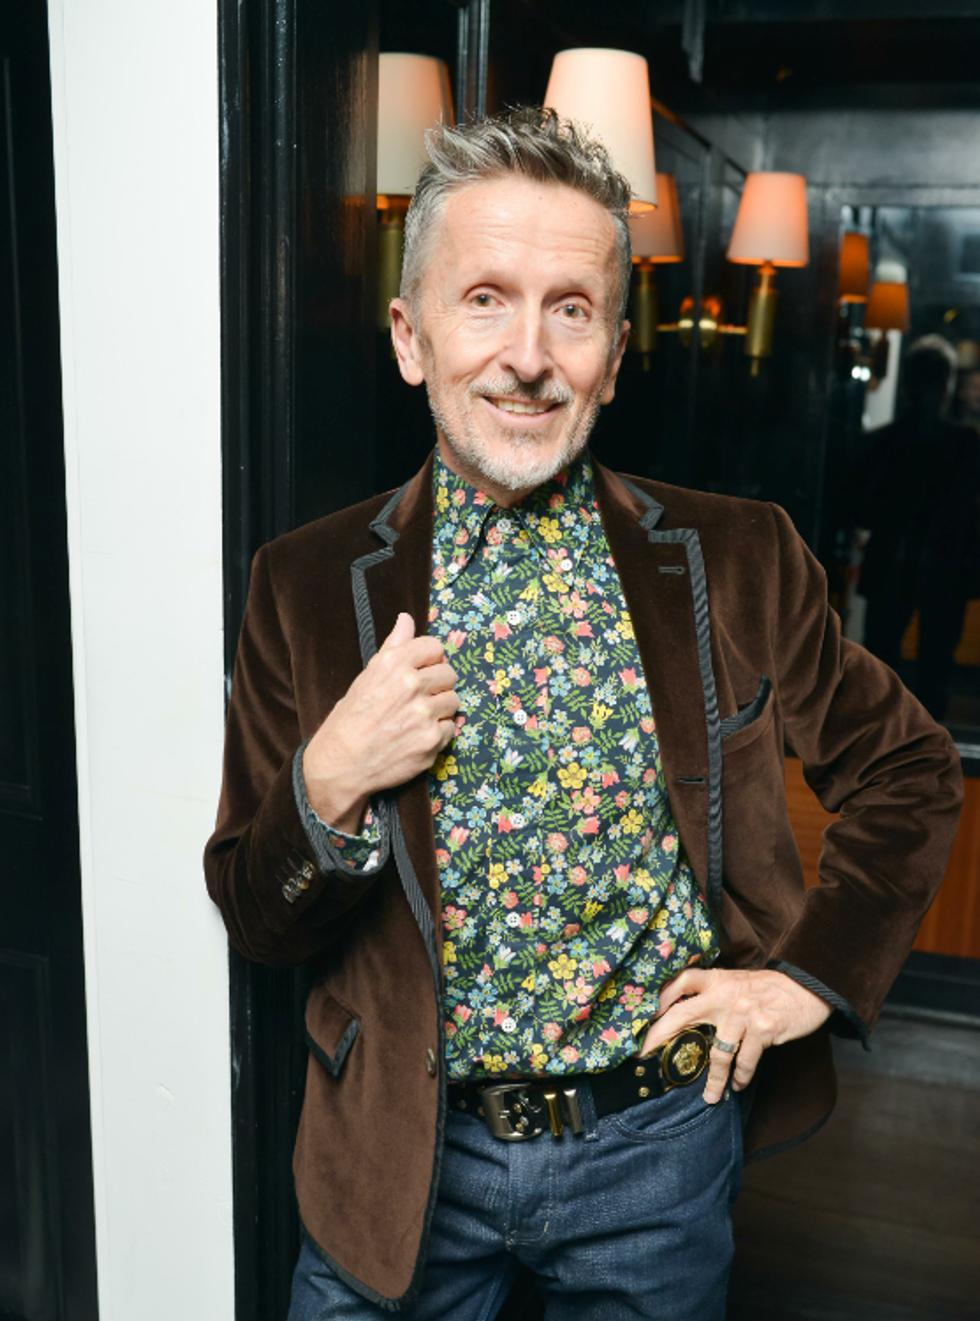 Simon Doonan On the Relationship Between Salami and Fashion